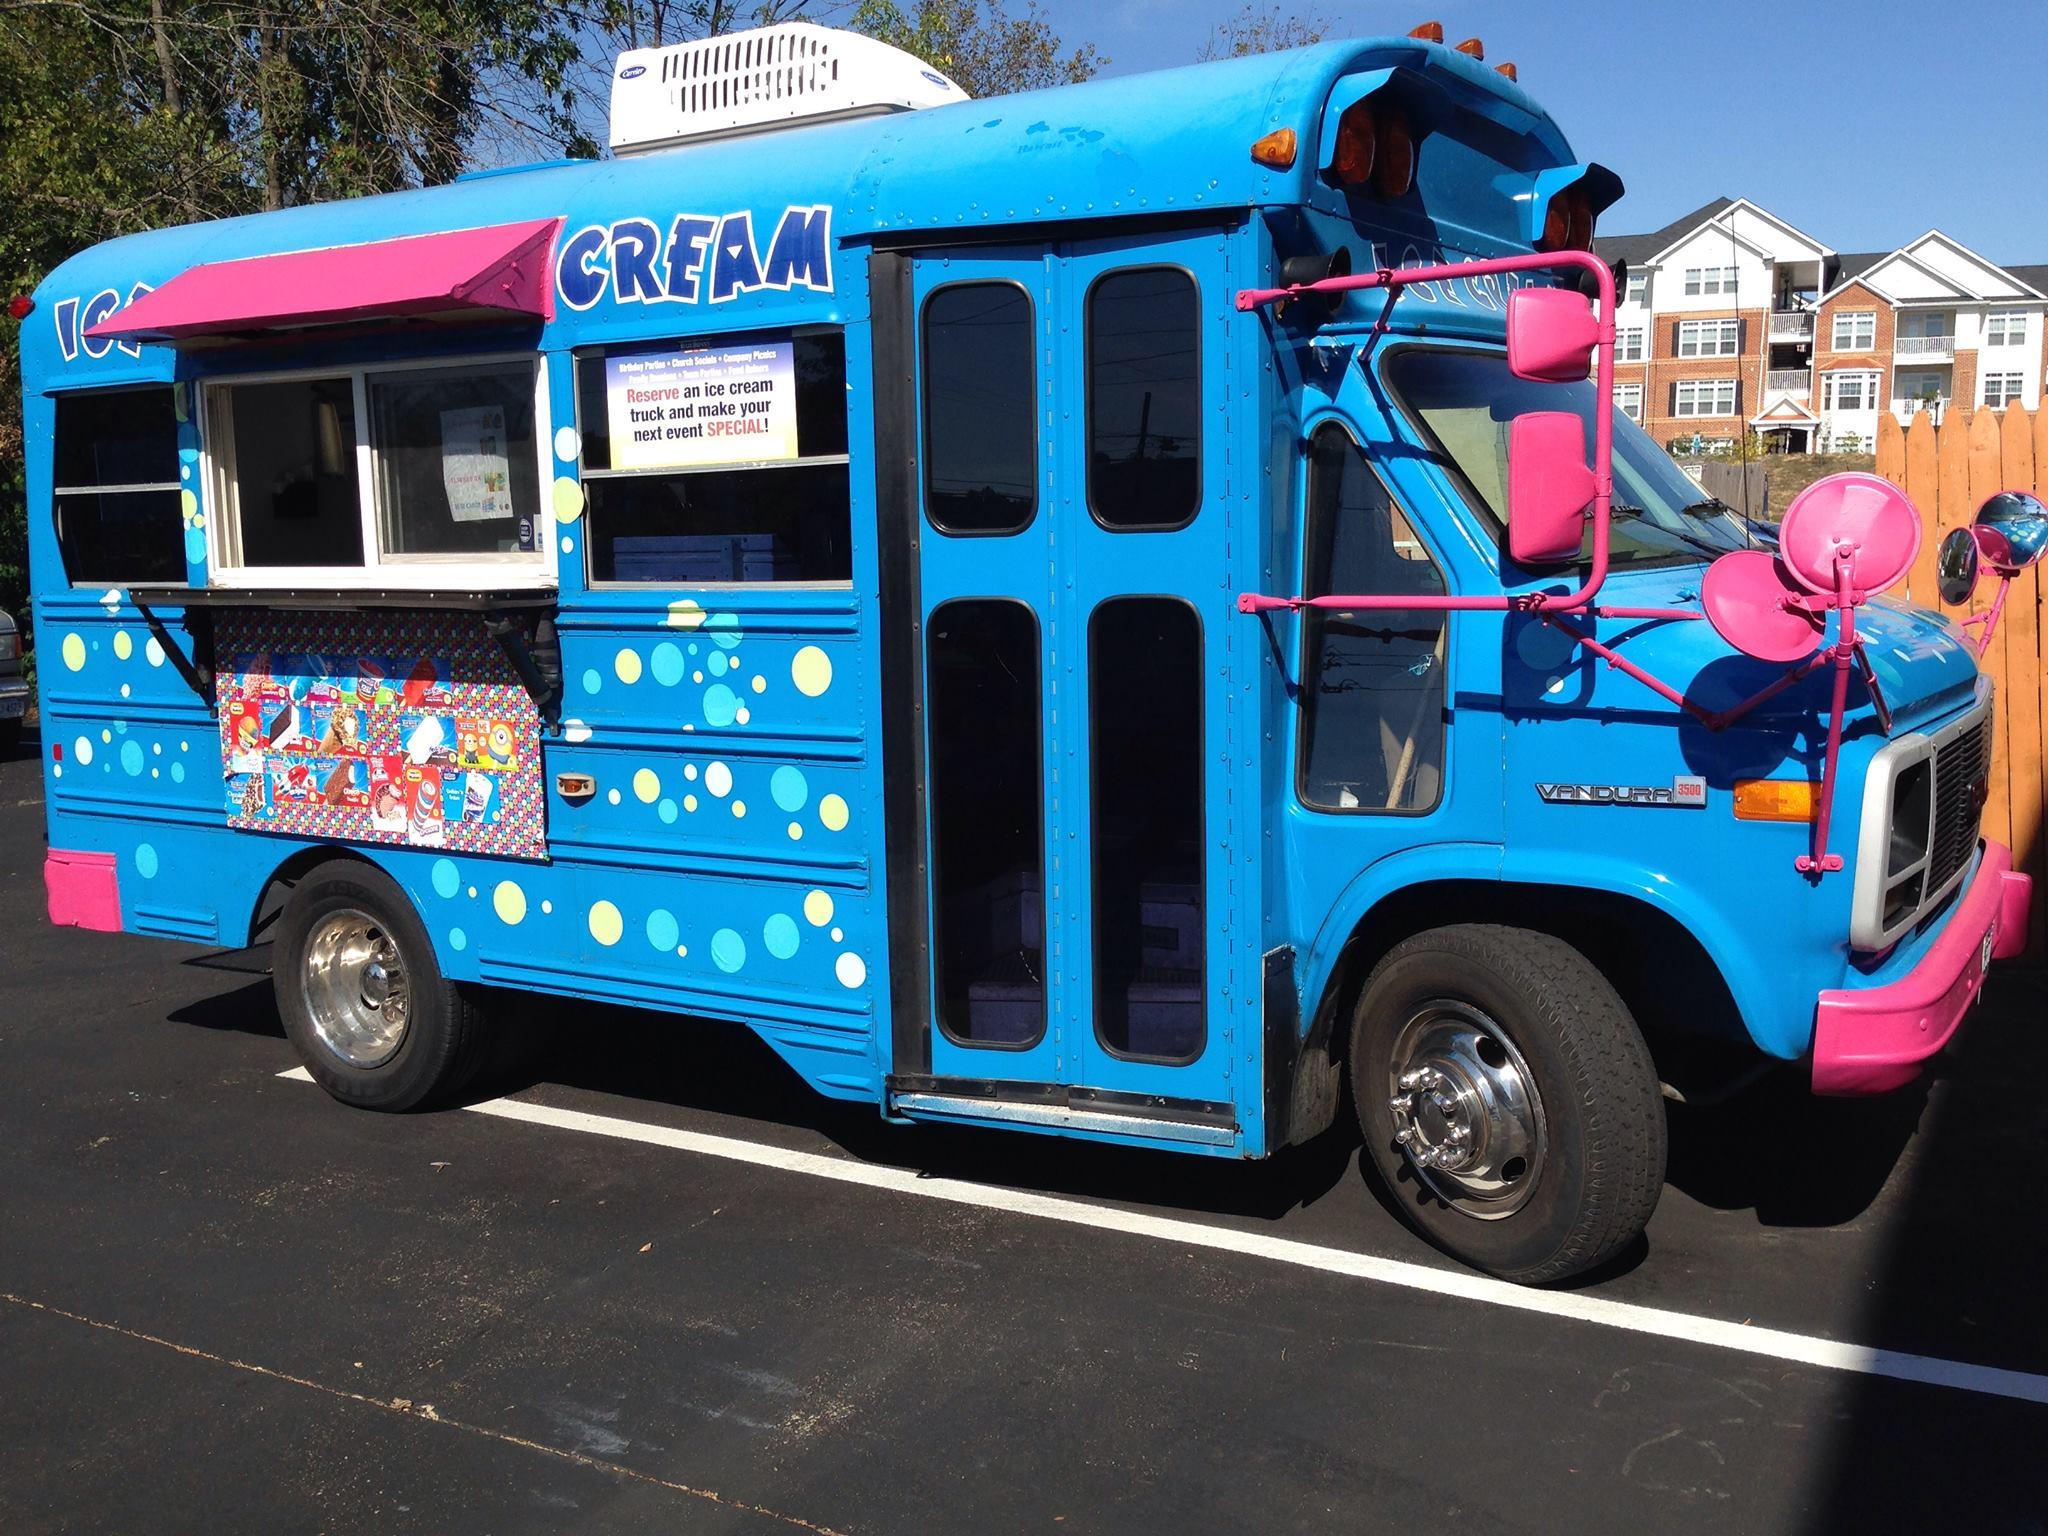 Ice Cream Truck For Sale >> Frufetti | Food Trucks In Fairfax VA